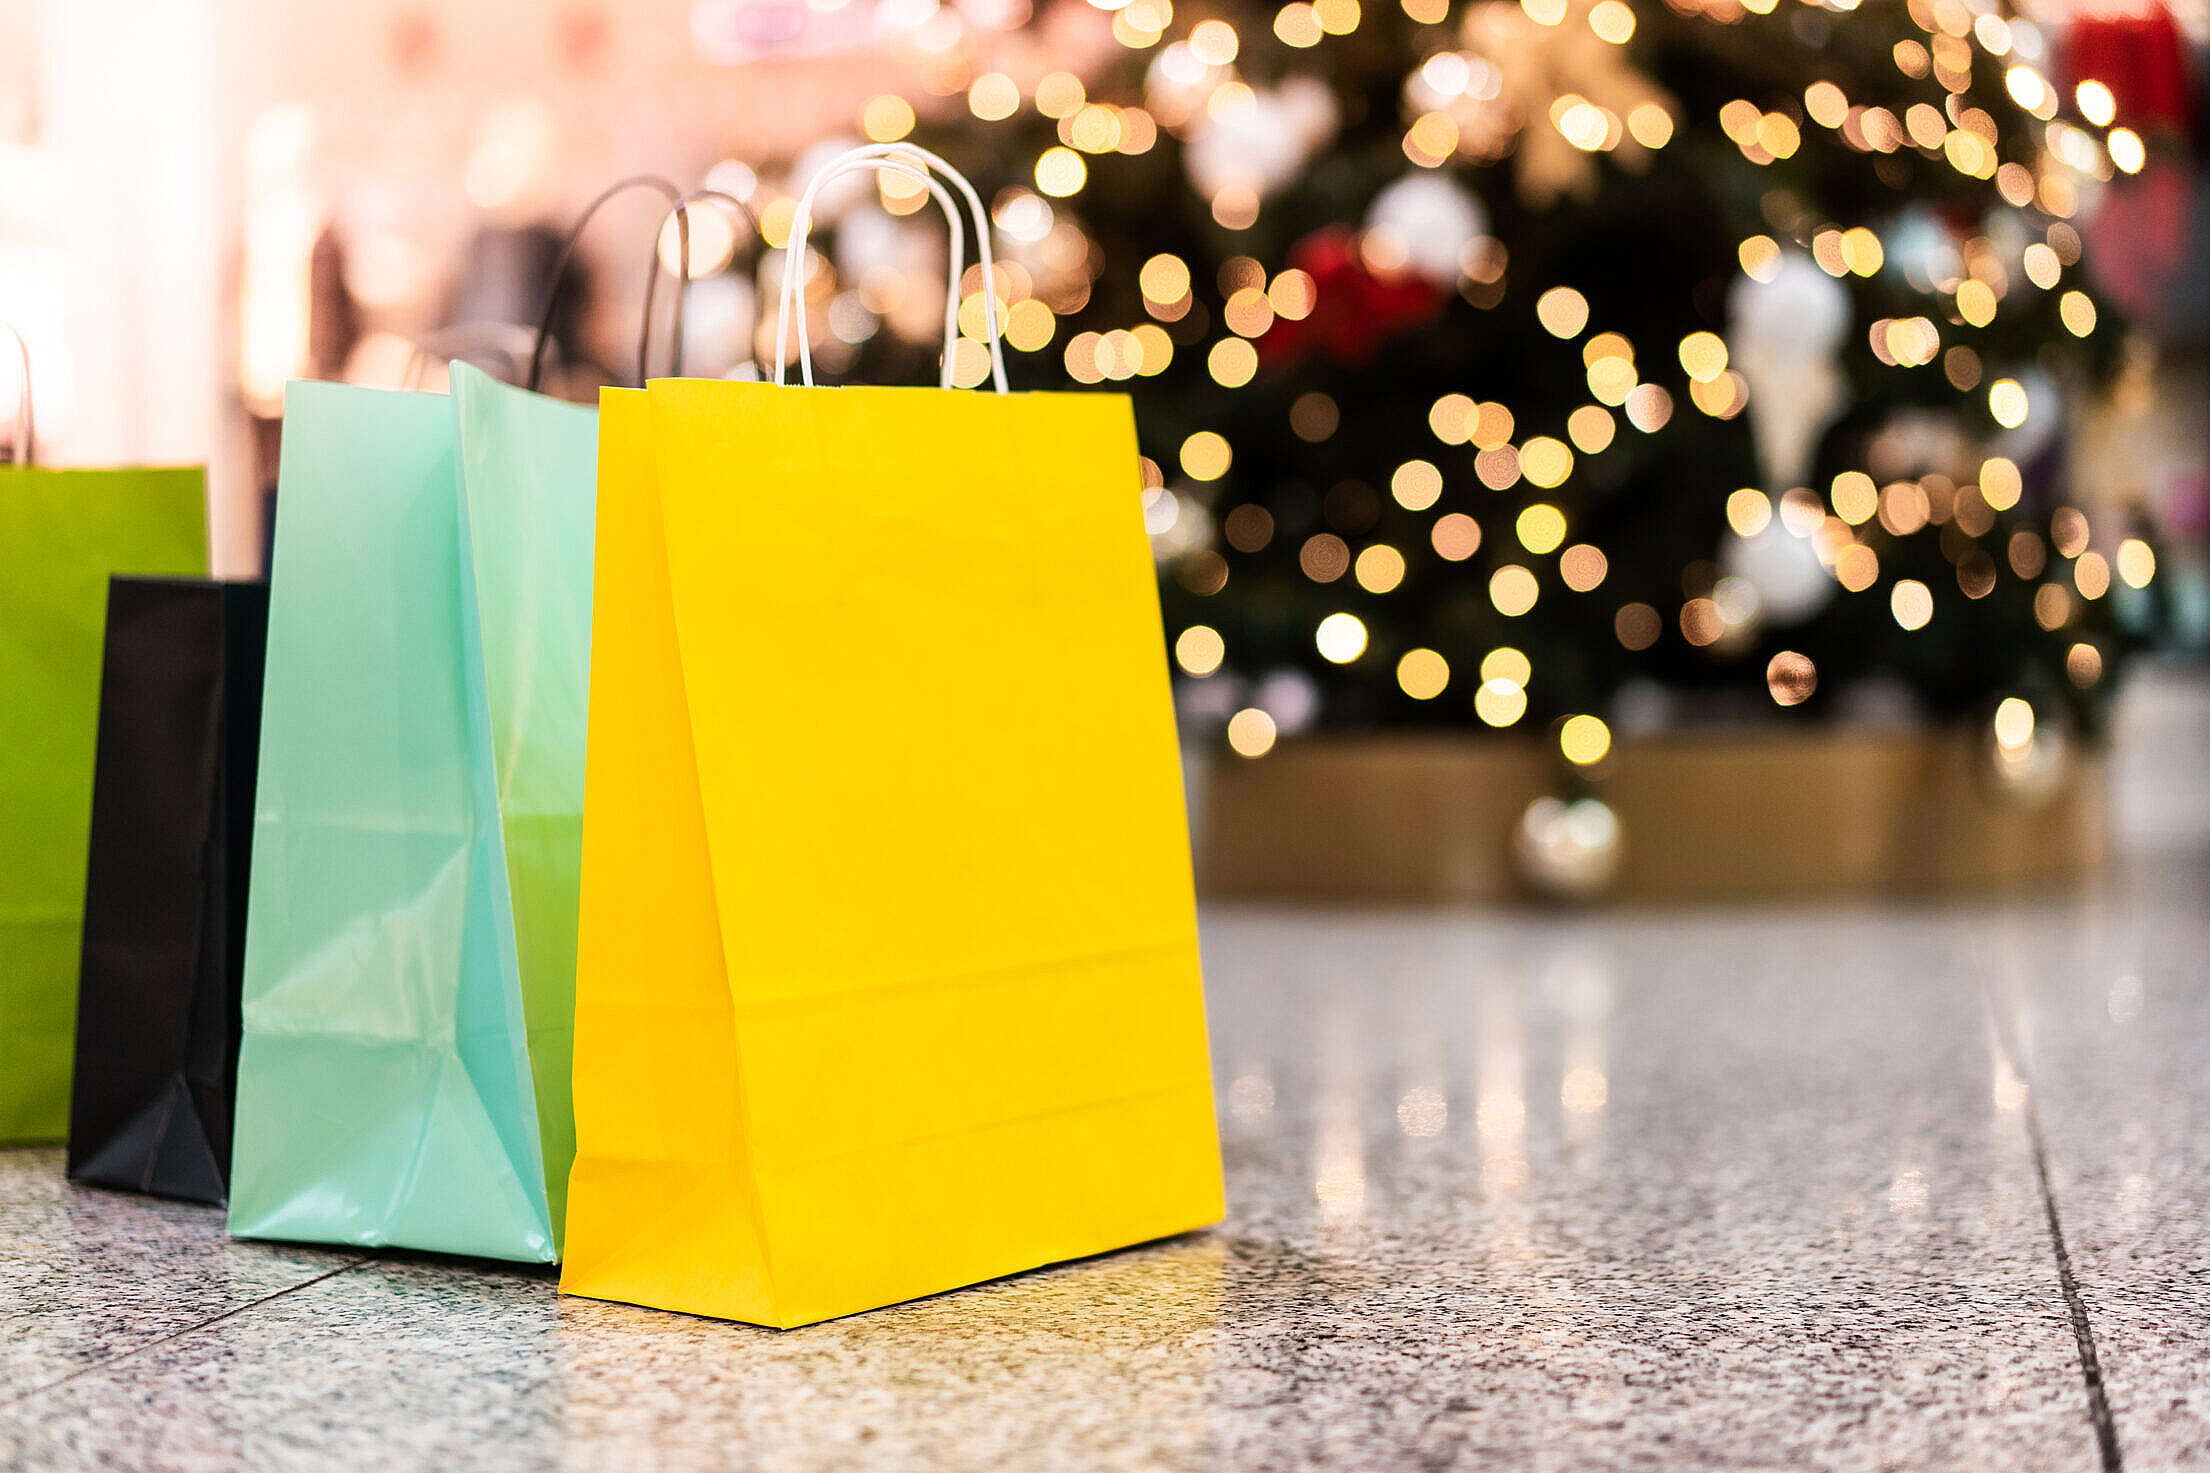 Christmas Shopping Bags Free Stock Photo